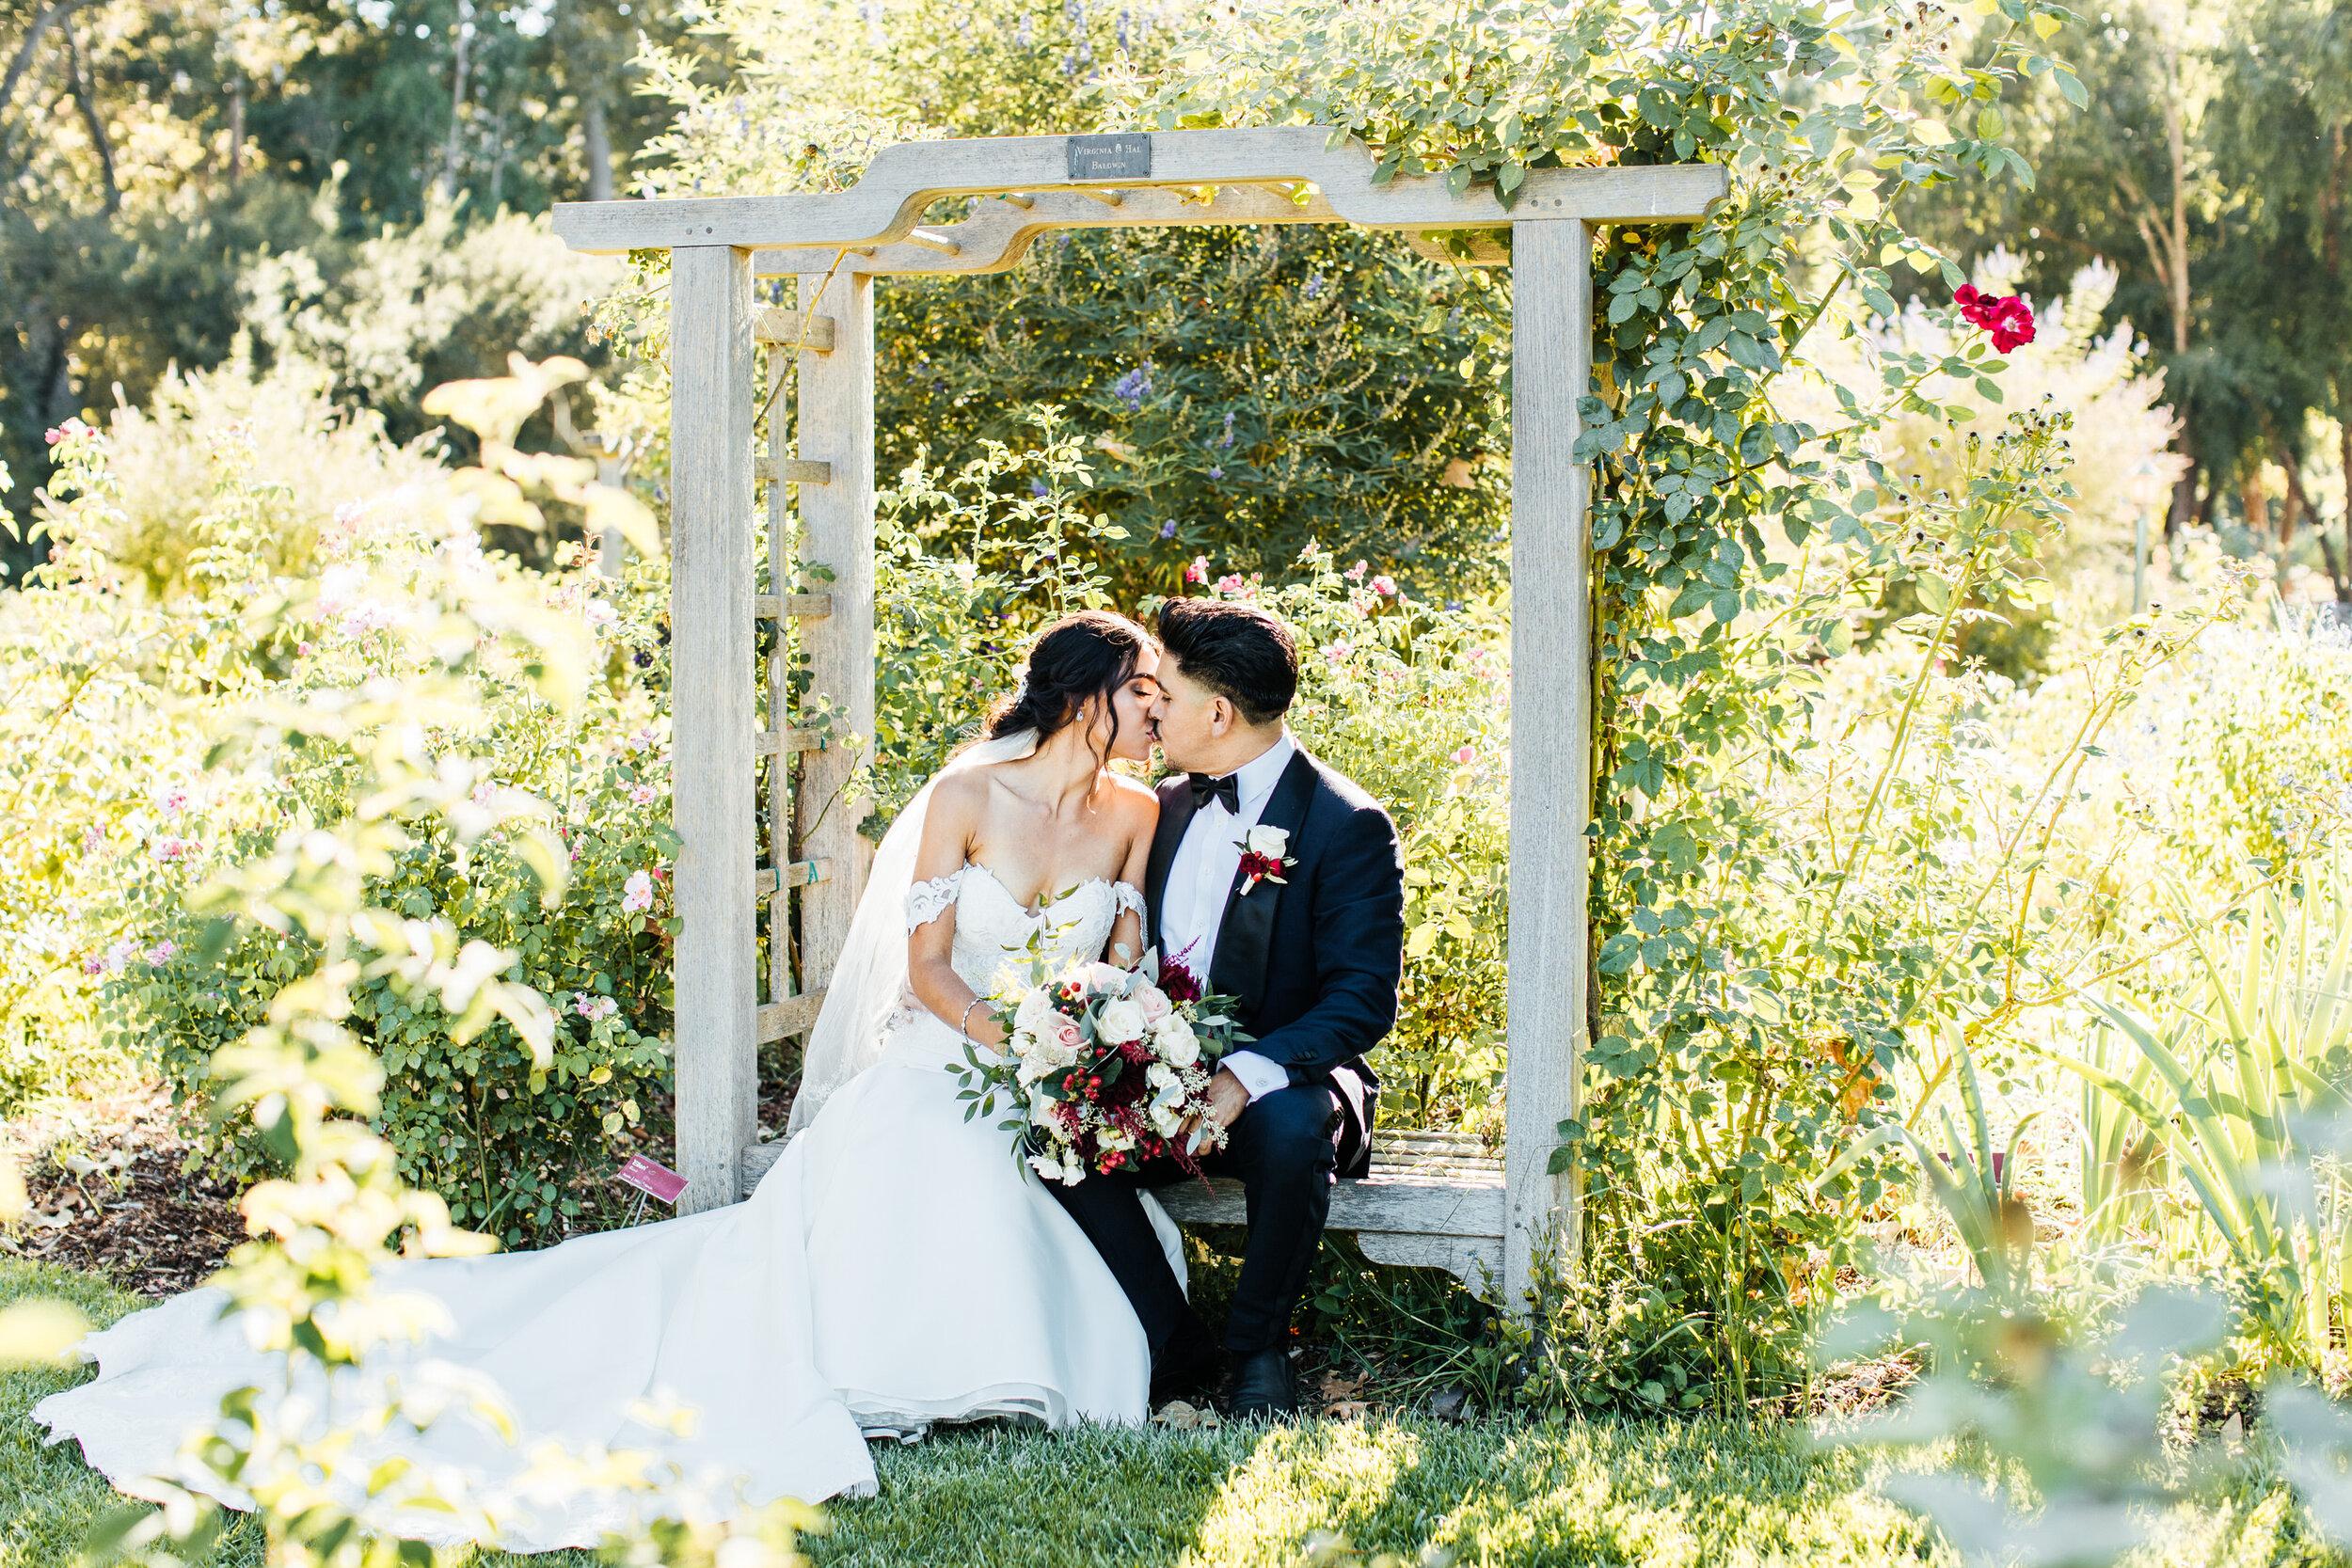 descanso-gardens-wedding-los-angeles-wedding-photographer-socal-wedding-photographer-erin-marton-photography.jpg